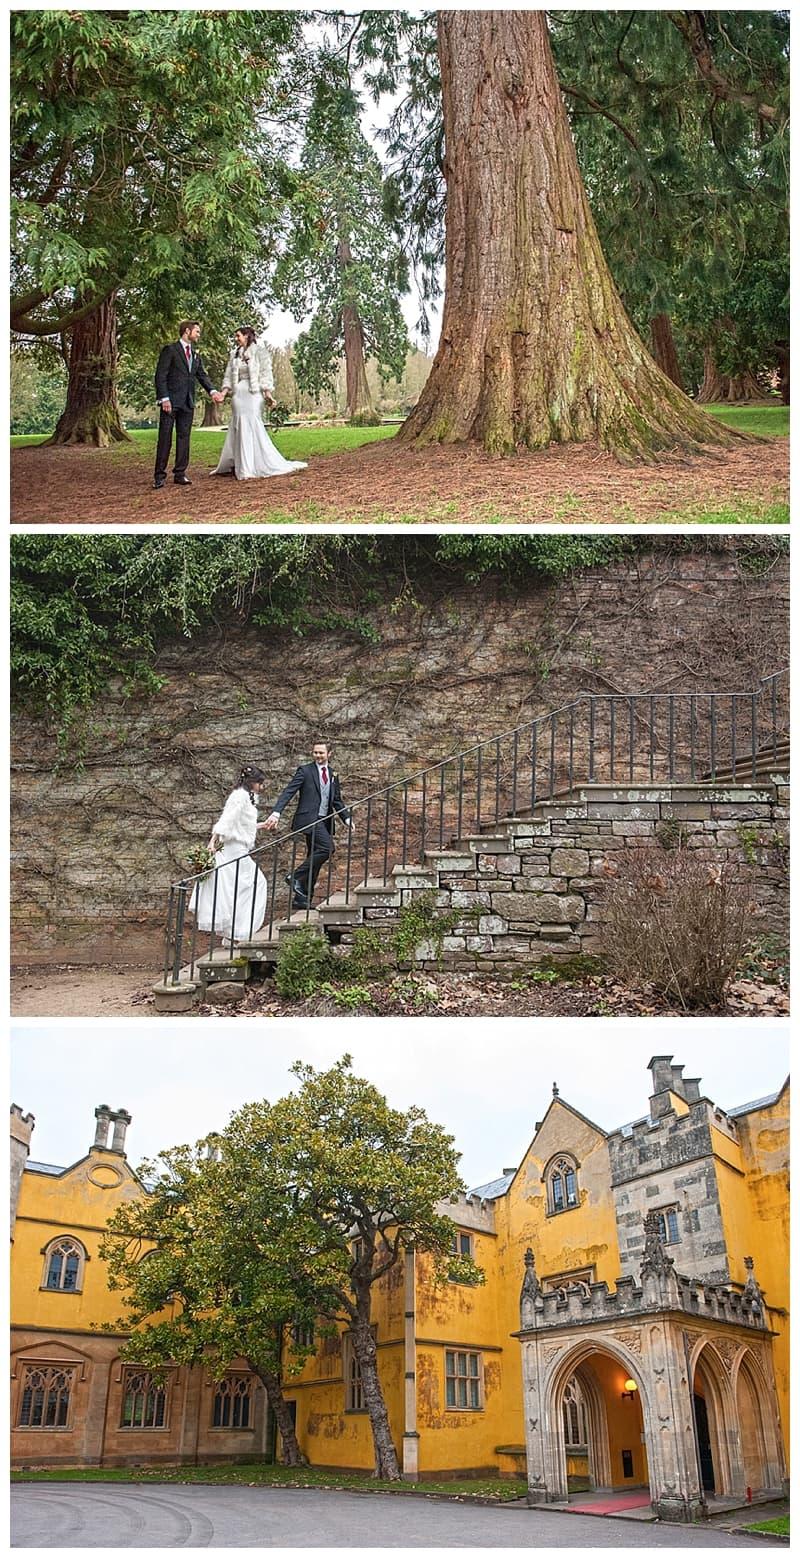 Ashton Court Estate Wedding, Leon & Anna, Clifton Bridge Wedding - Benjamin Wetherall Photography ©0064